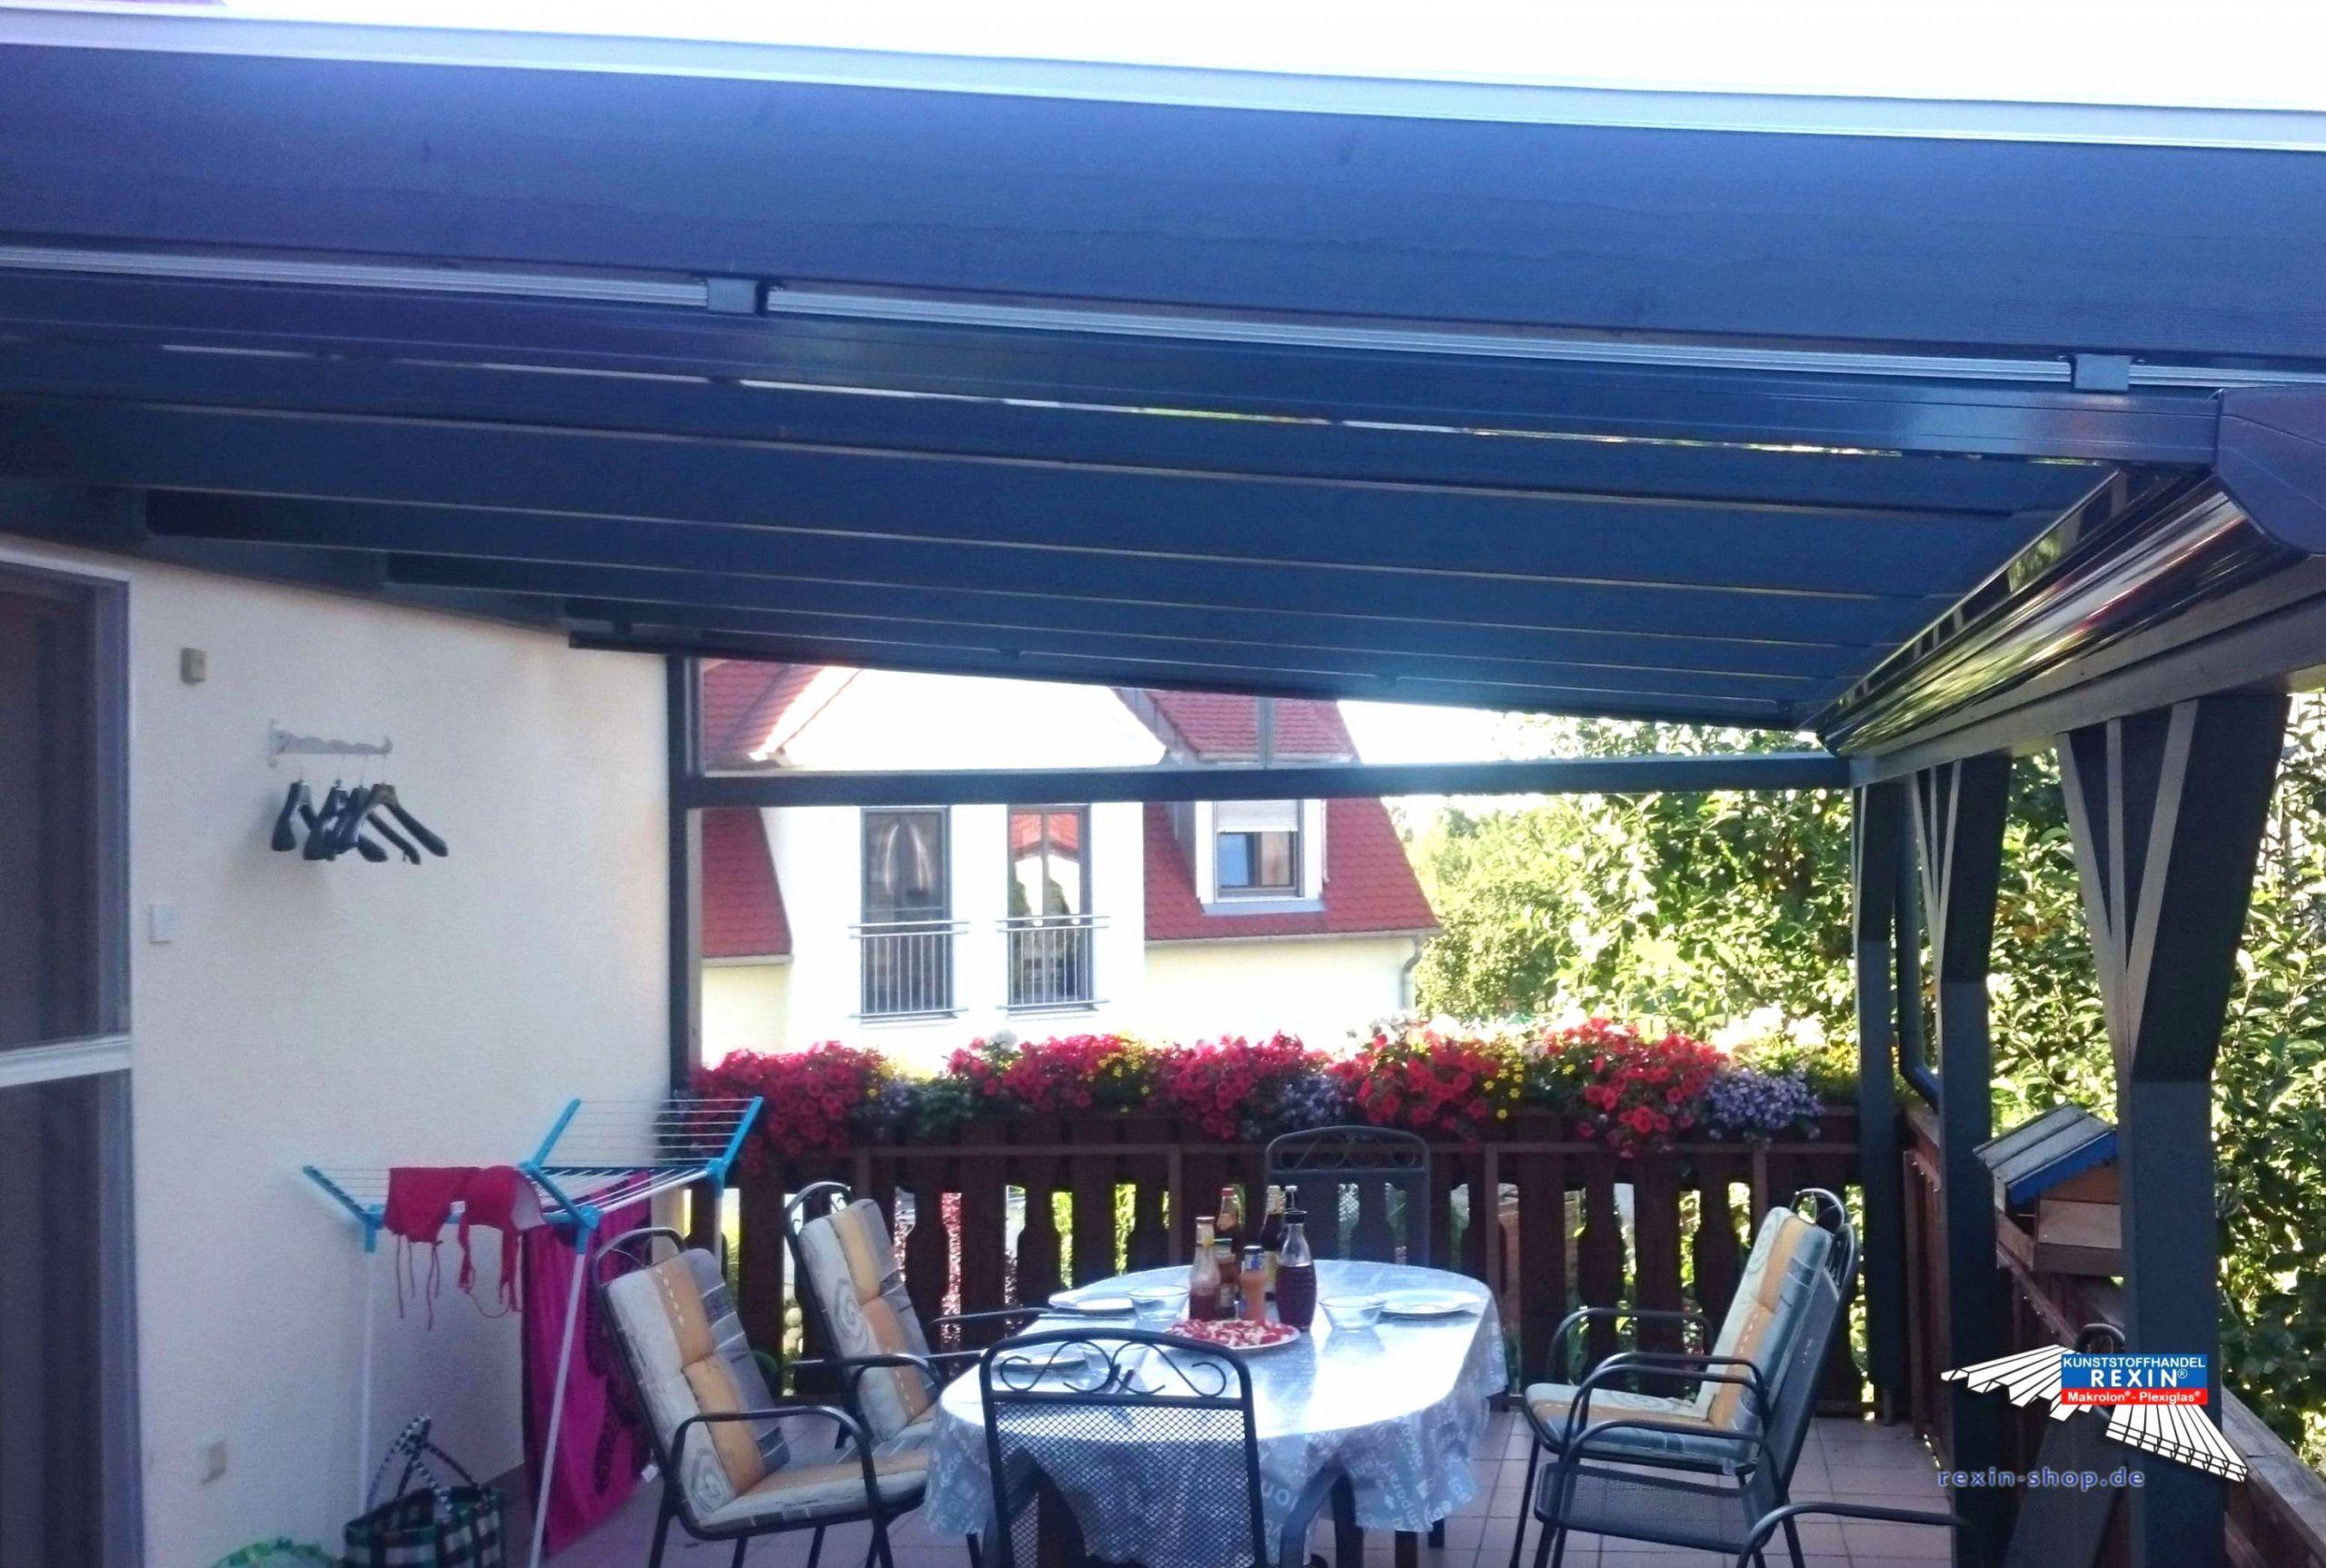 40 genial terrassen deko selber machen terrassen deko selbst gemacht terrassen deko selbst gemacht